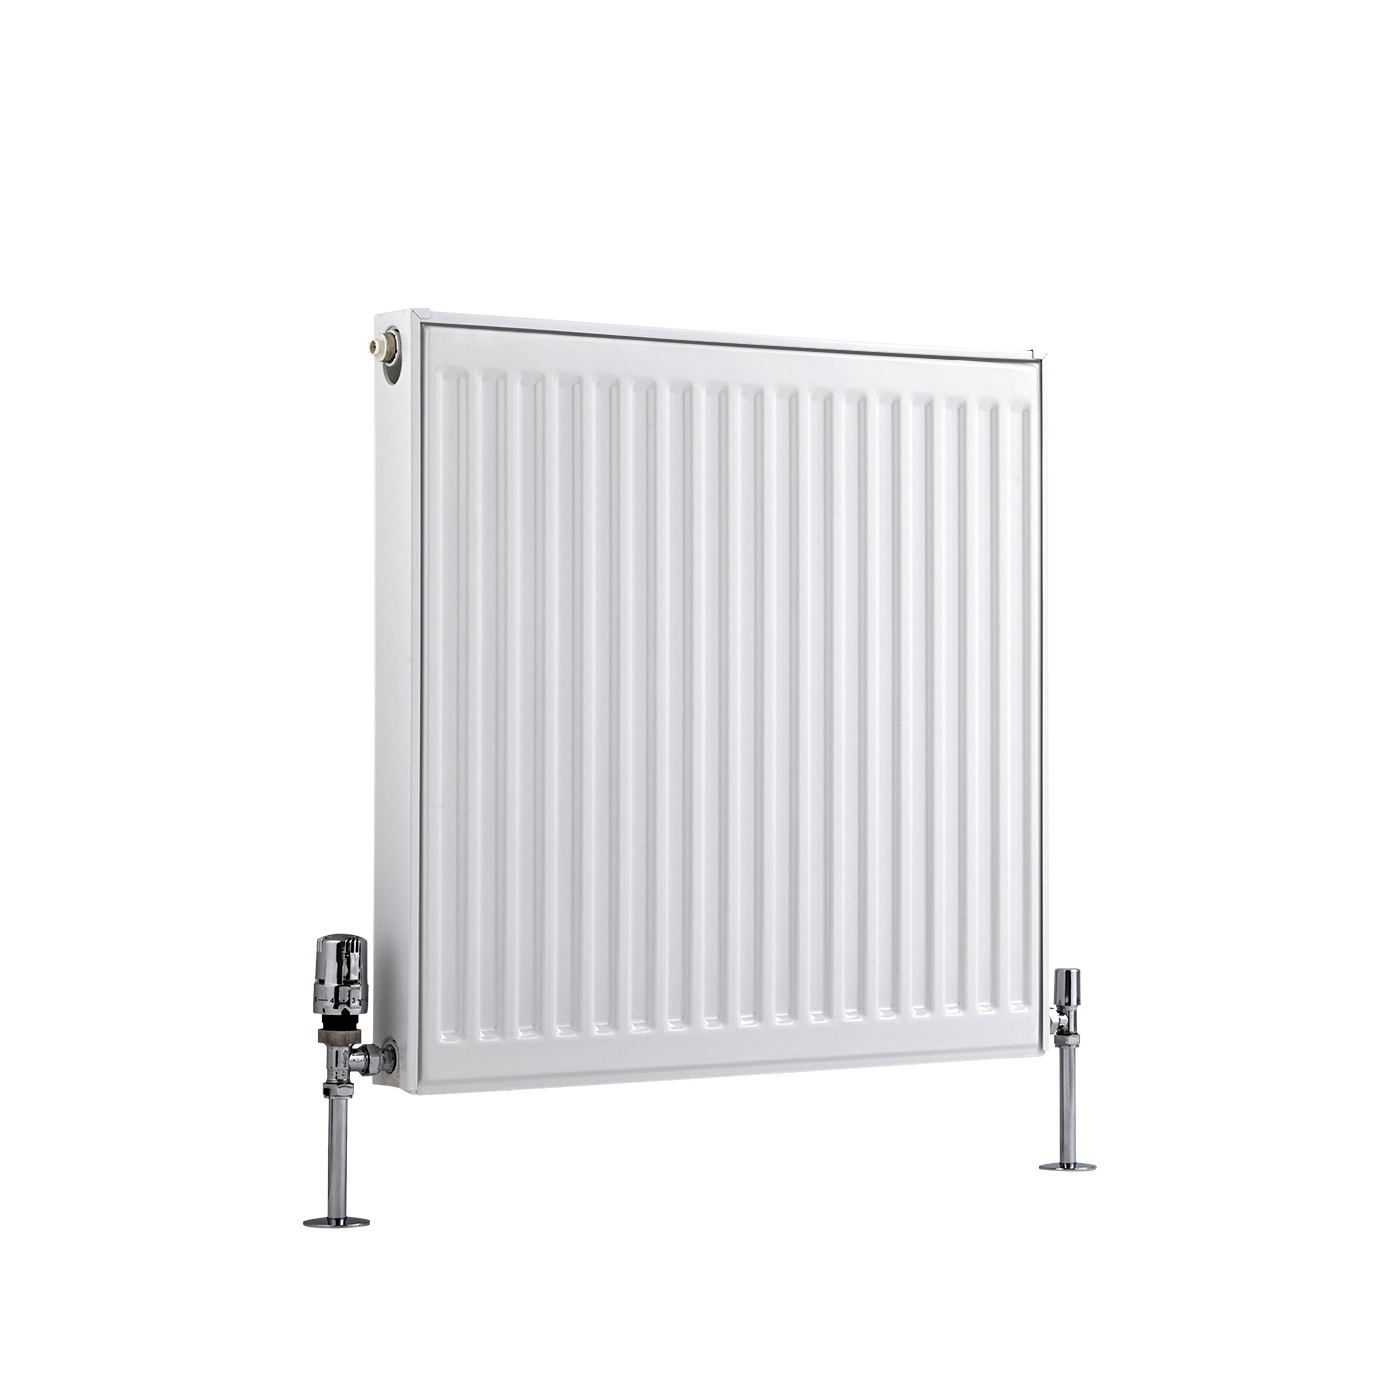 Radiateur À Panneaux Type 11 Horizontal Blanc Eco 60cm x 60cm x 5cm 555 Watts